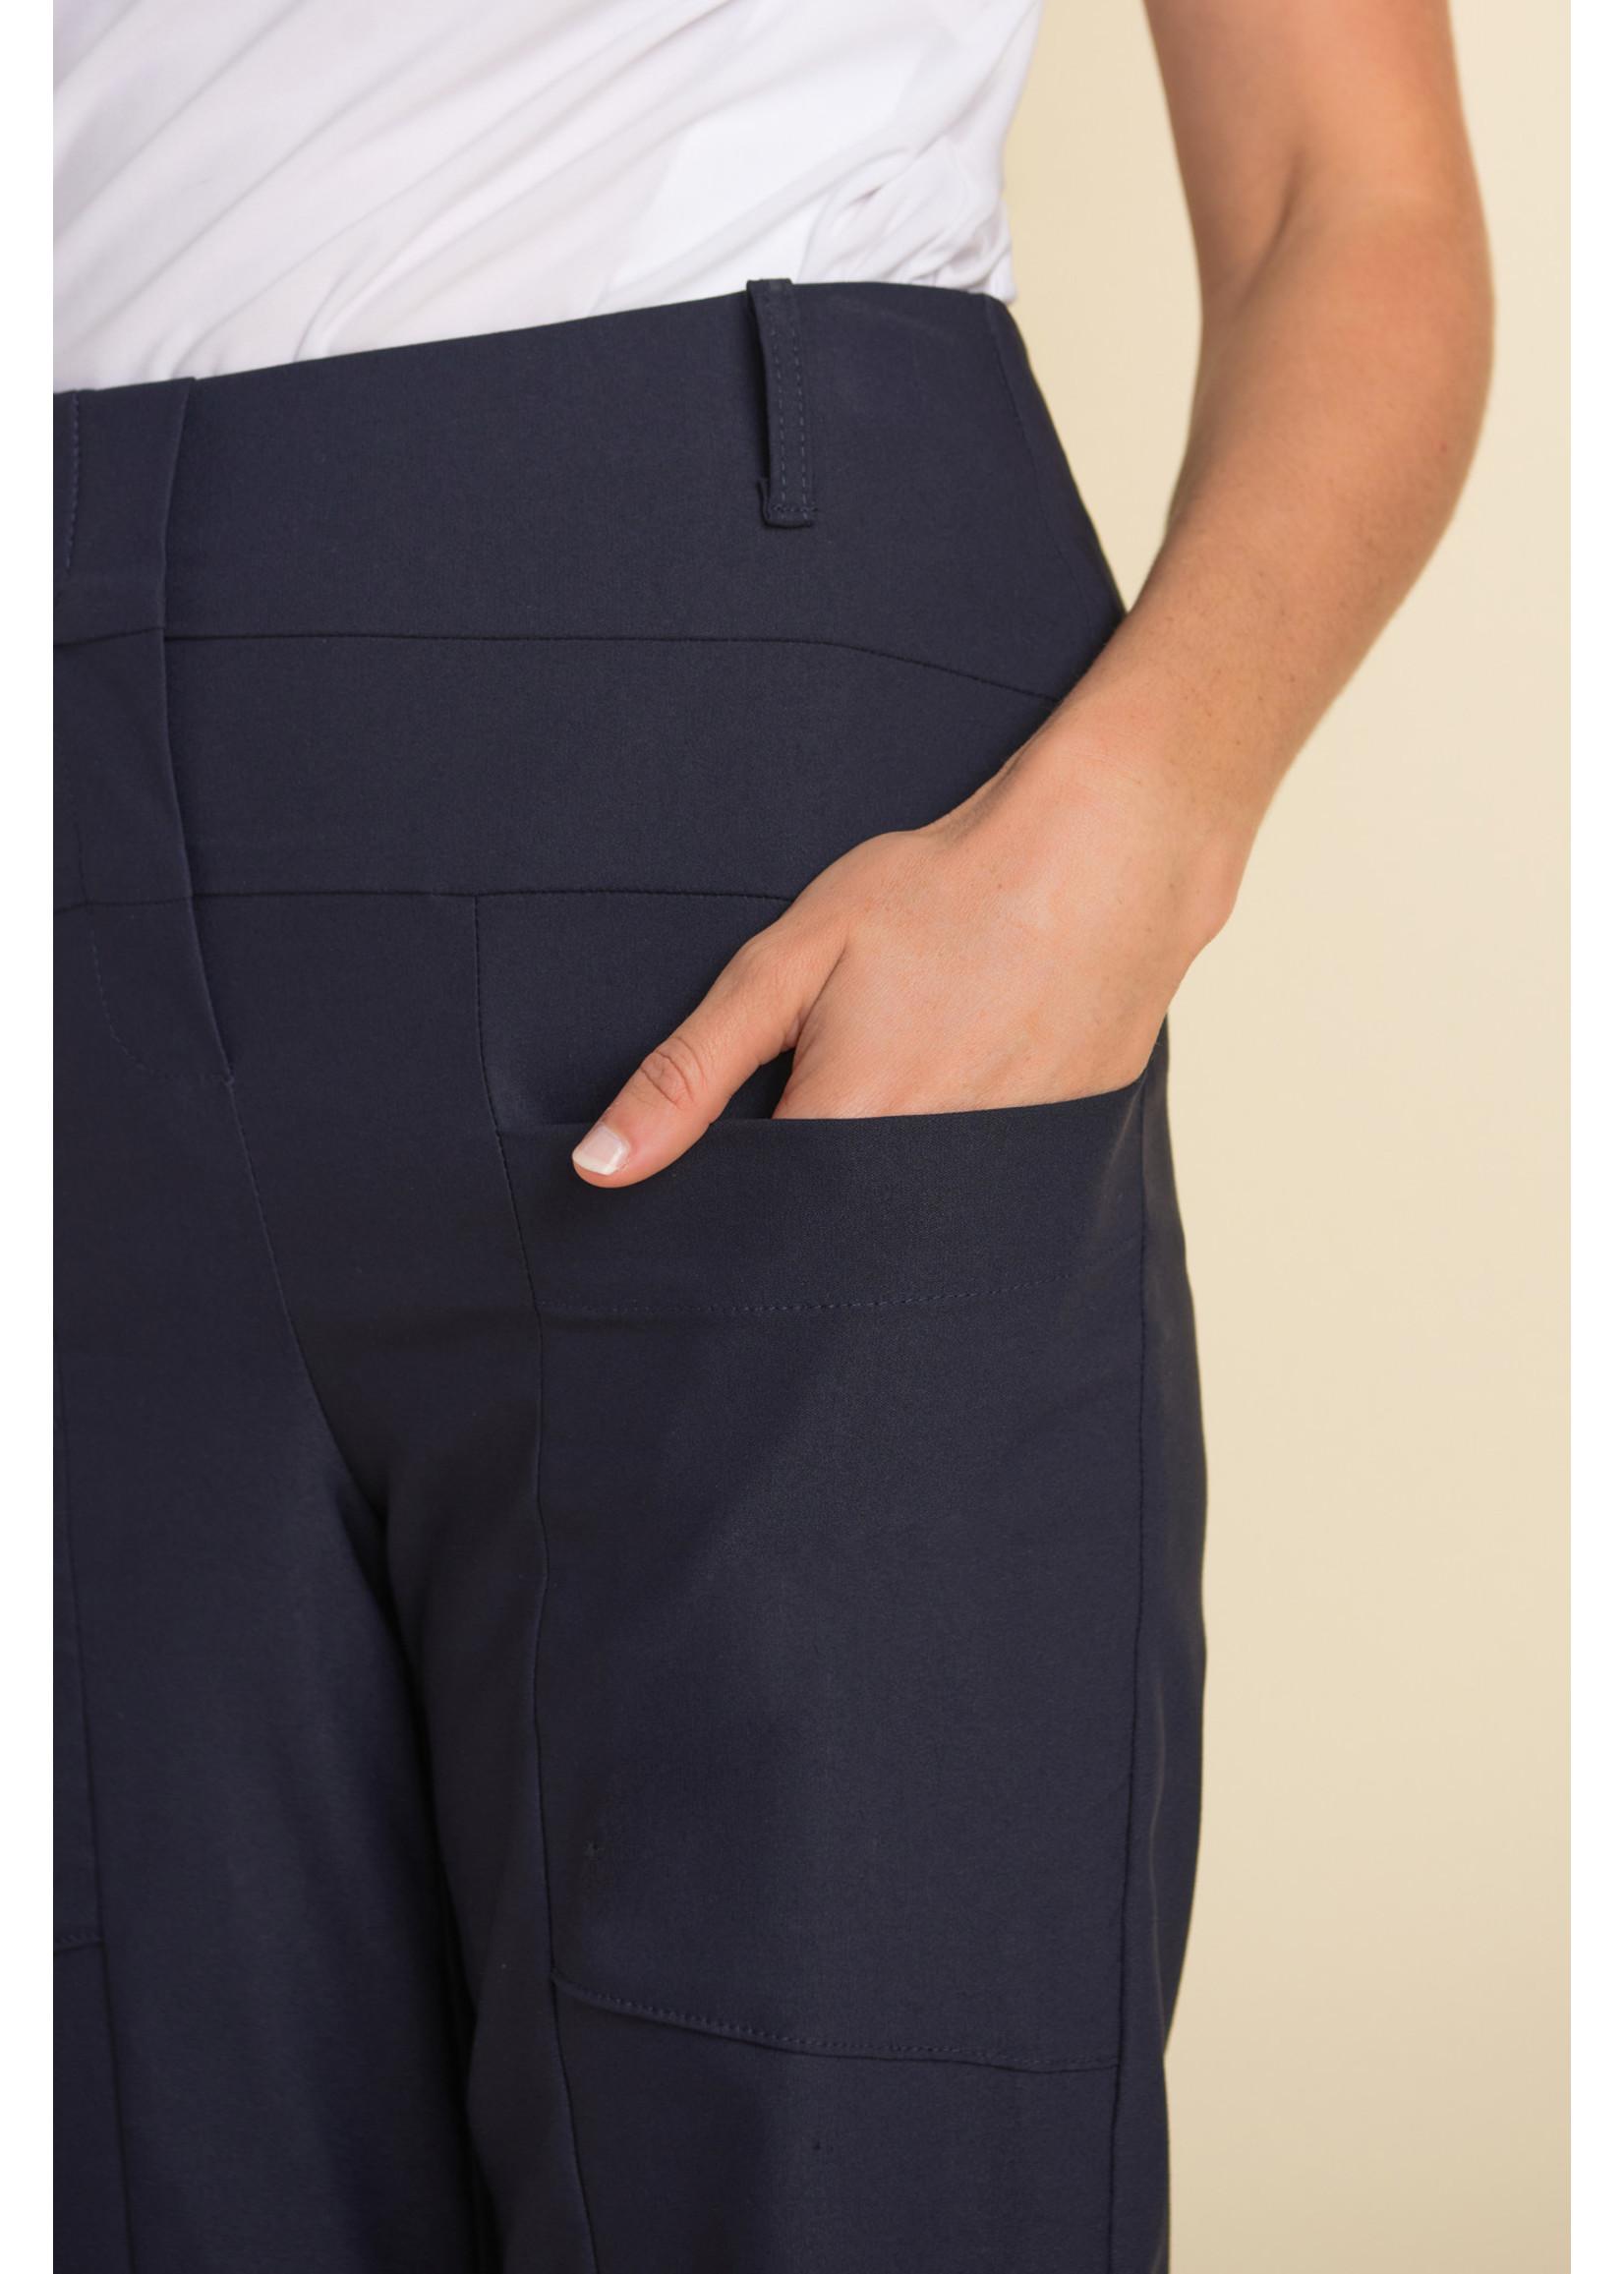 Joseph Ribkoff Navy Wide Leg Cropped Pant